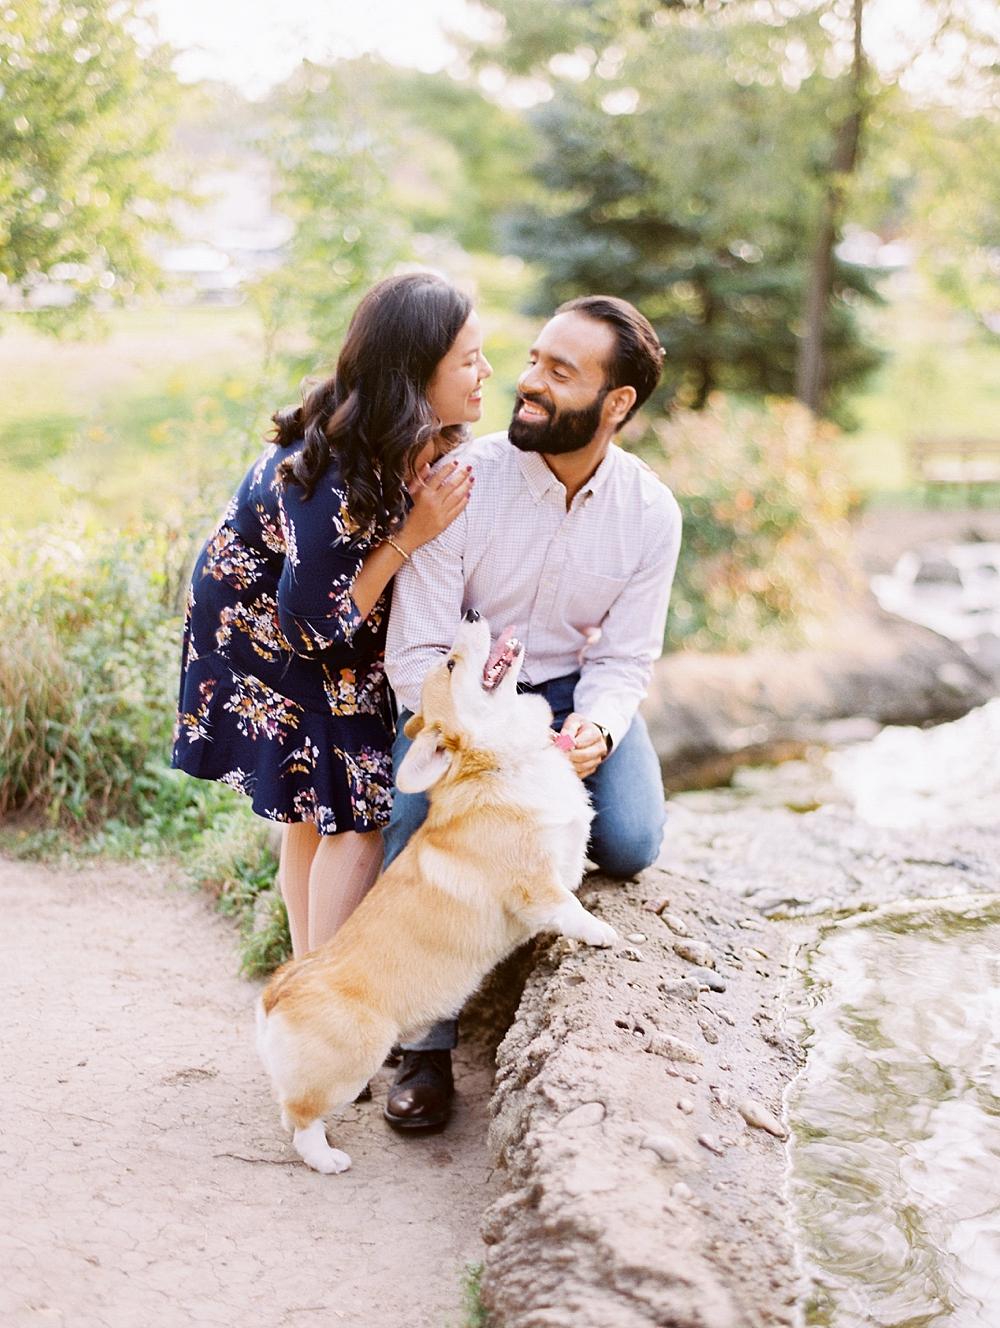 kristin-la-voie-photography-lake-katherine-chicago-wedding-photographer-59